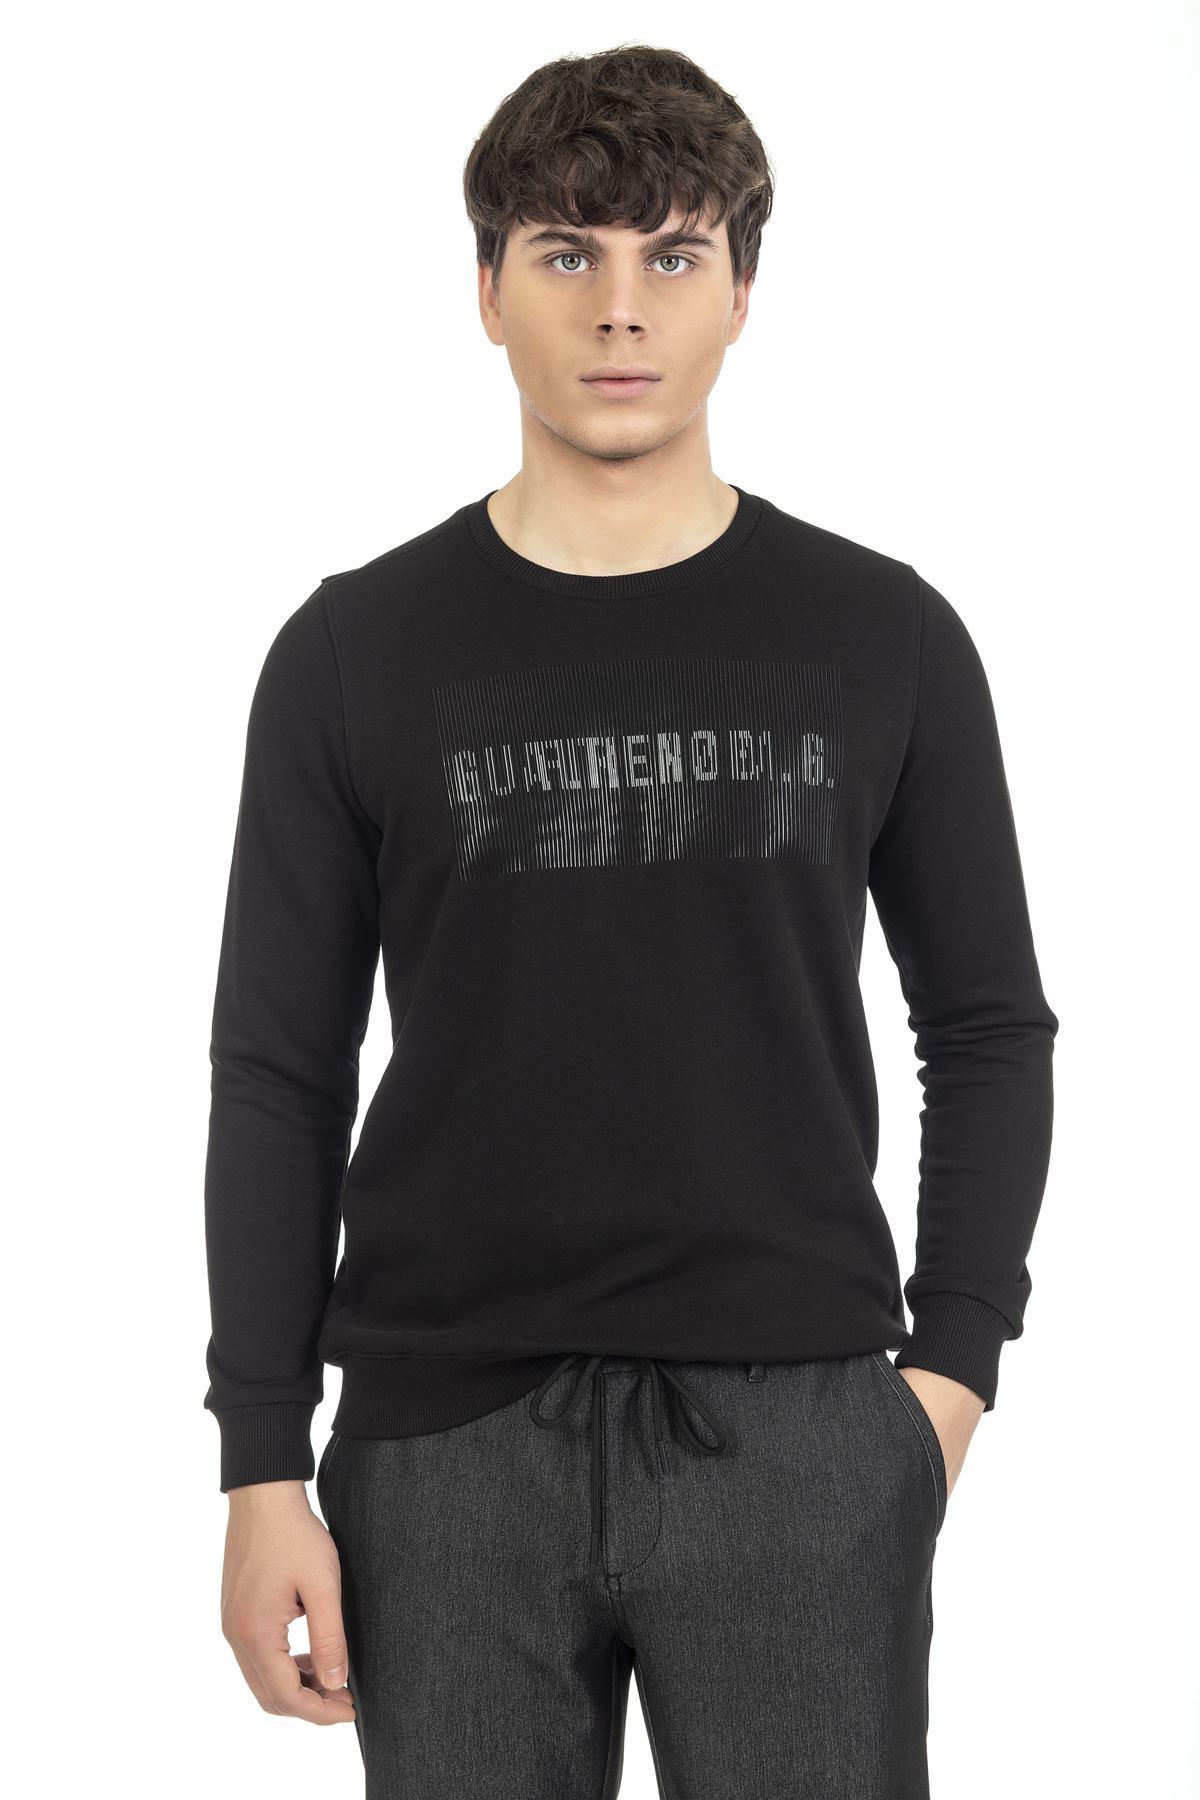 Siyah Bisiklet Yaka Baskılı Sweatshirt